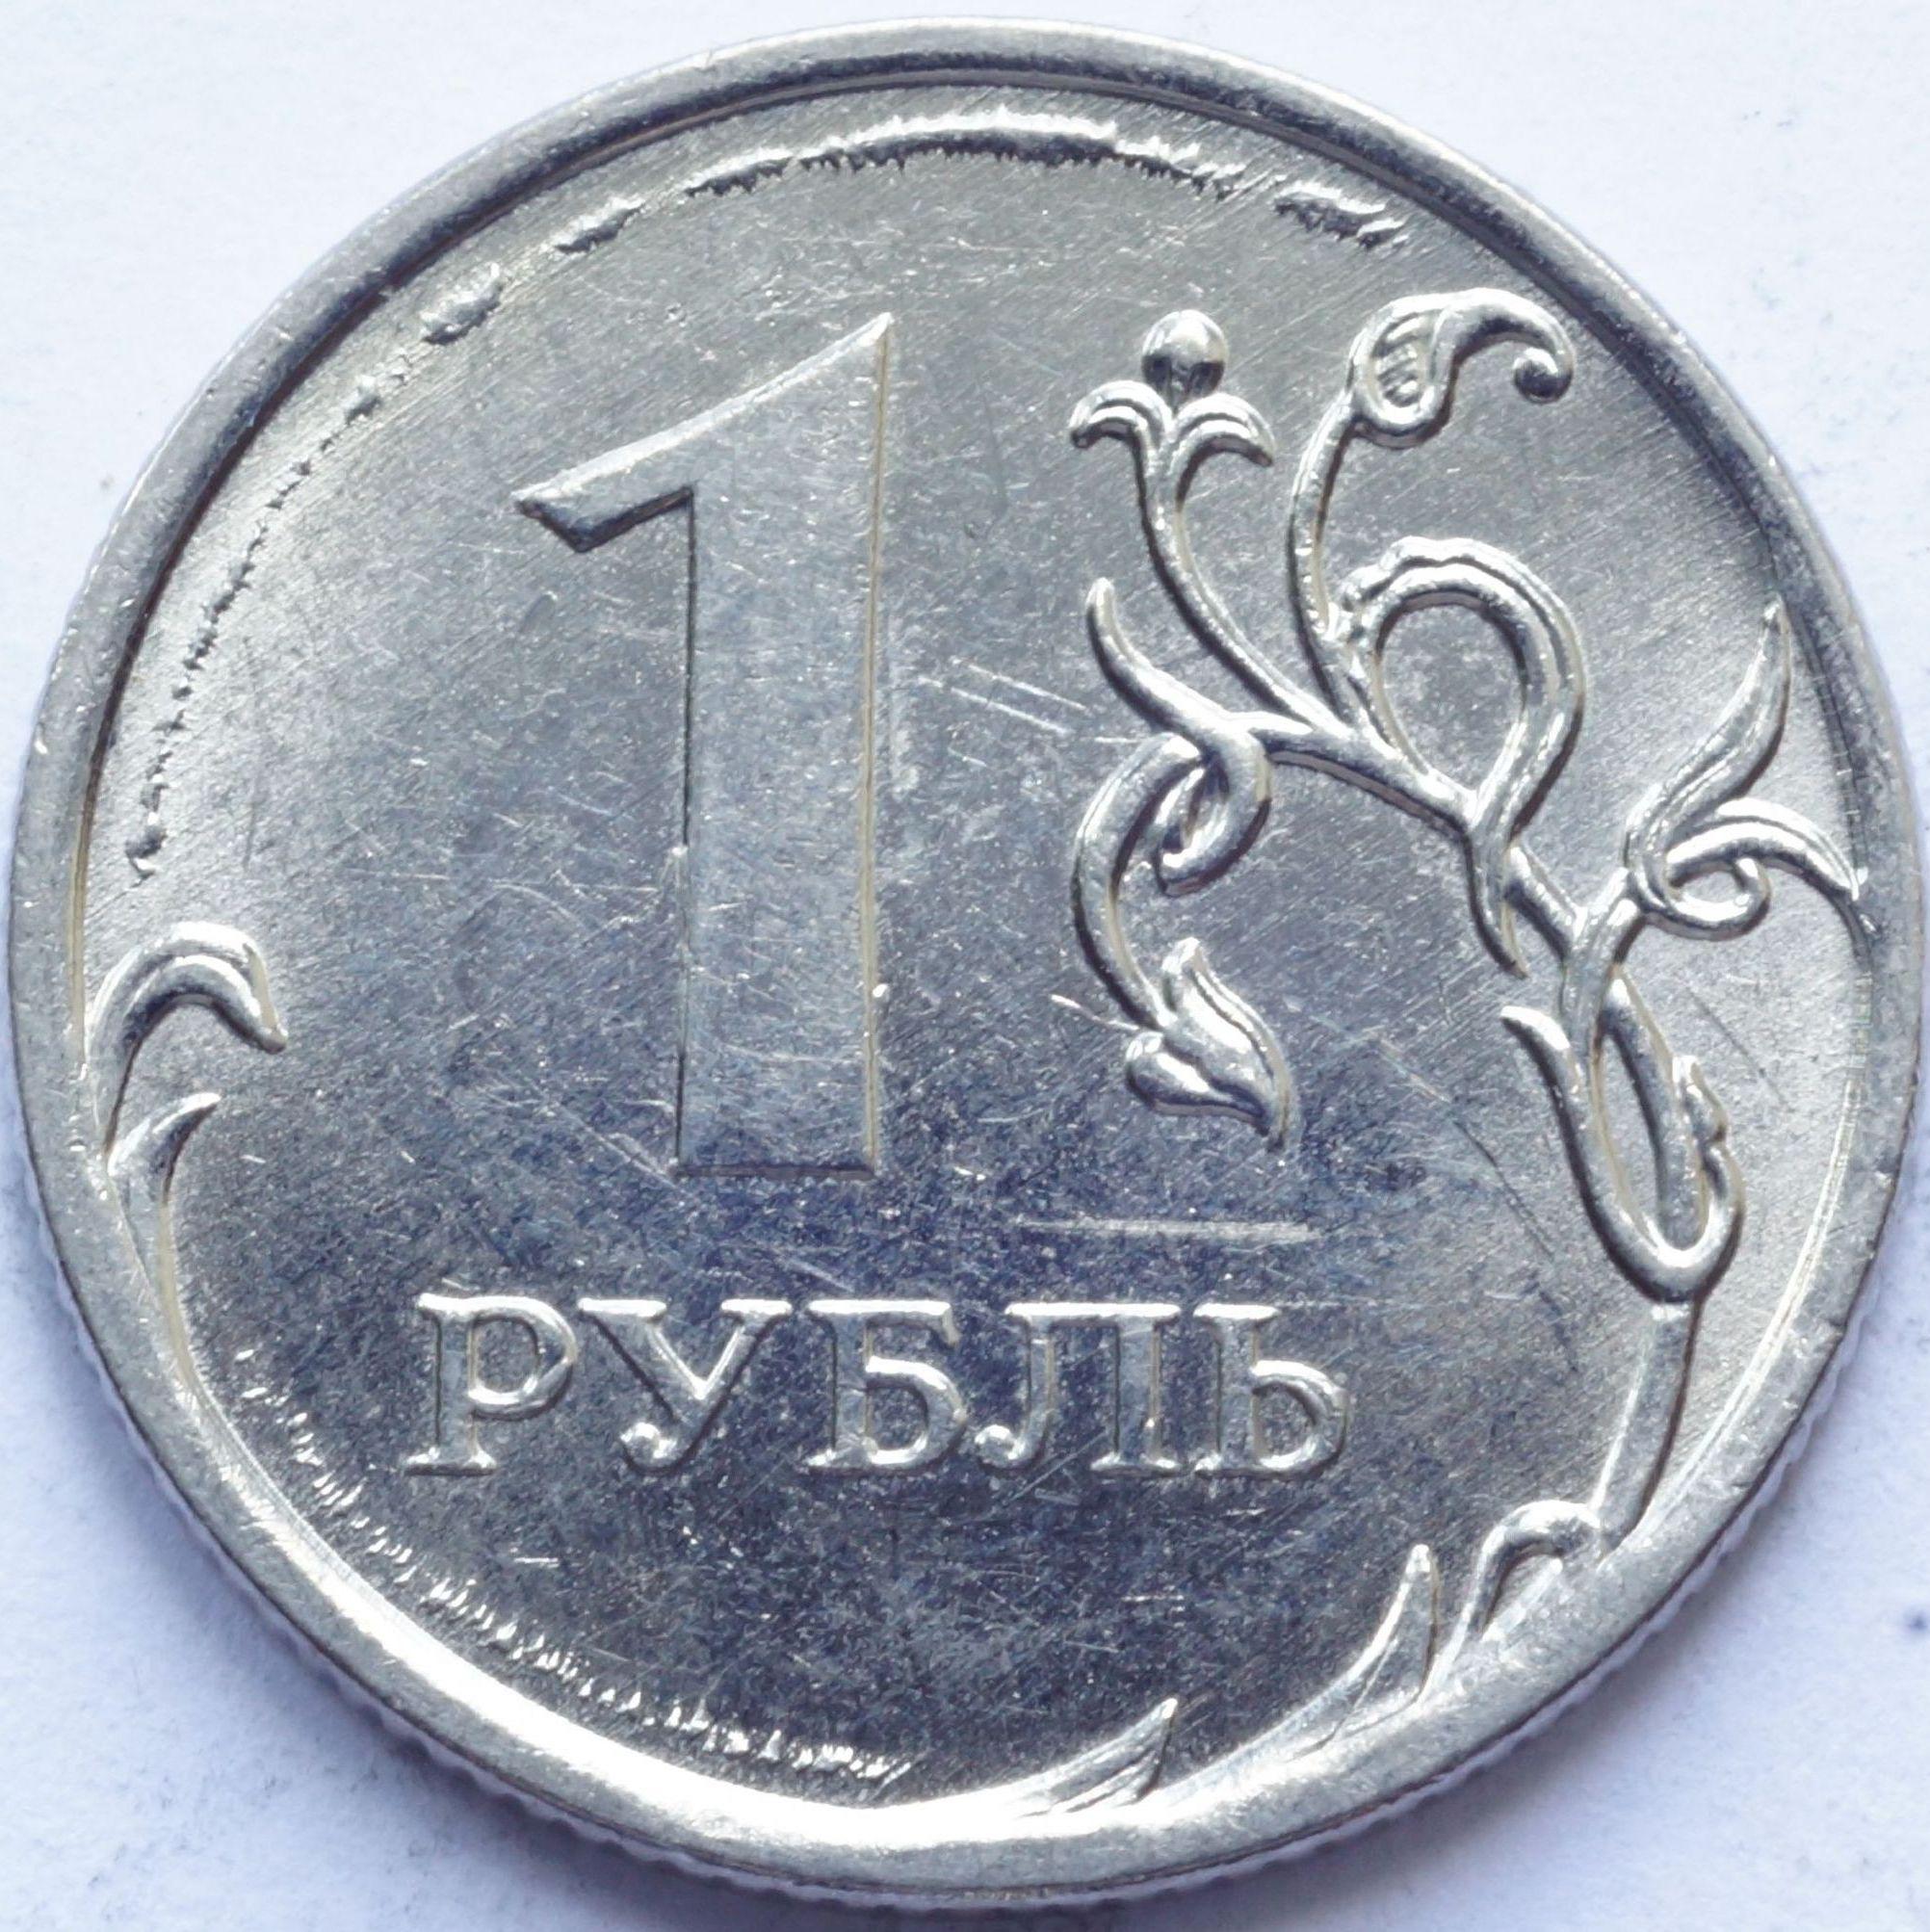 Брак монет 2016 года цена каталог монет россии 1700 1917 с ценами